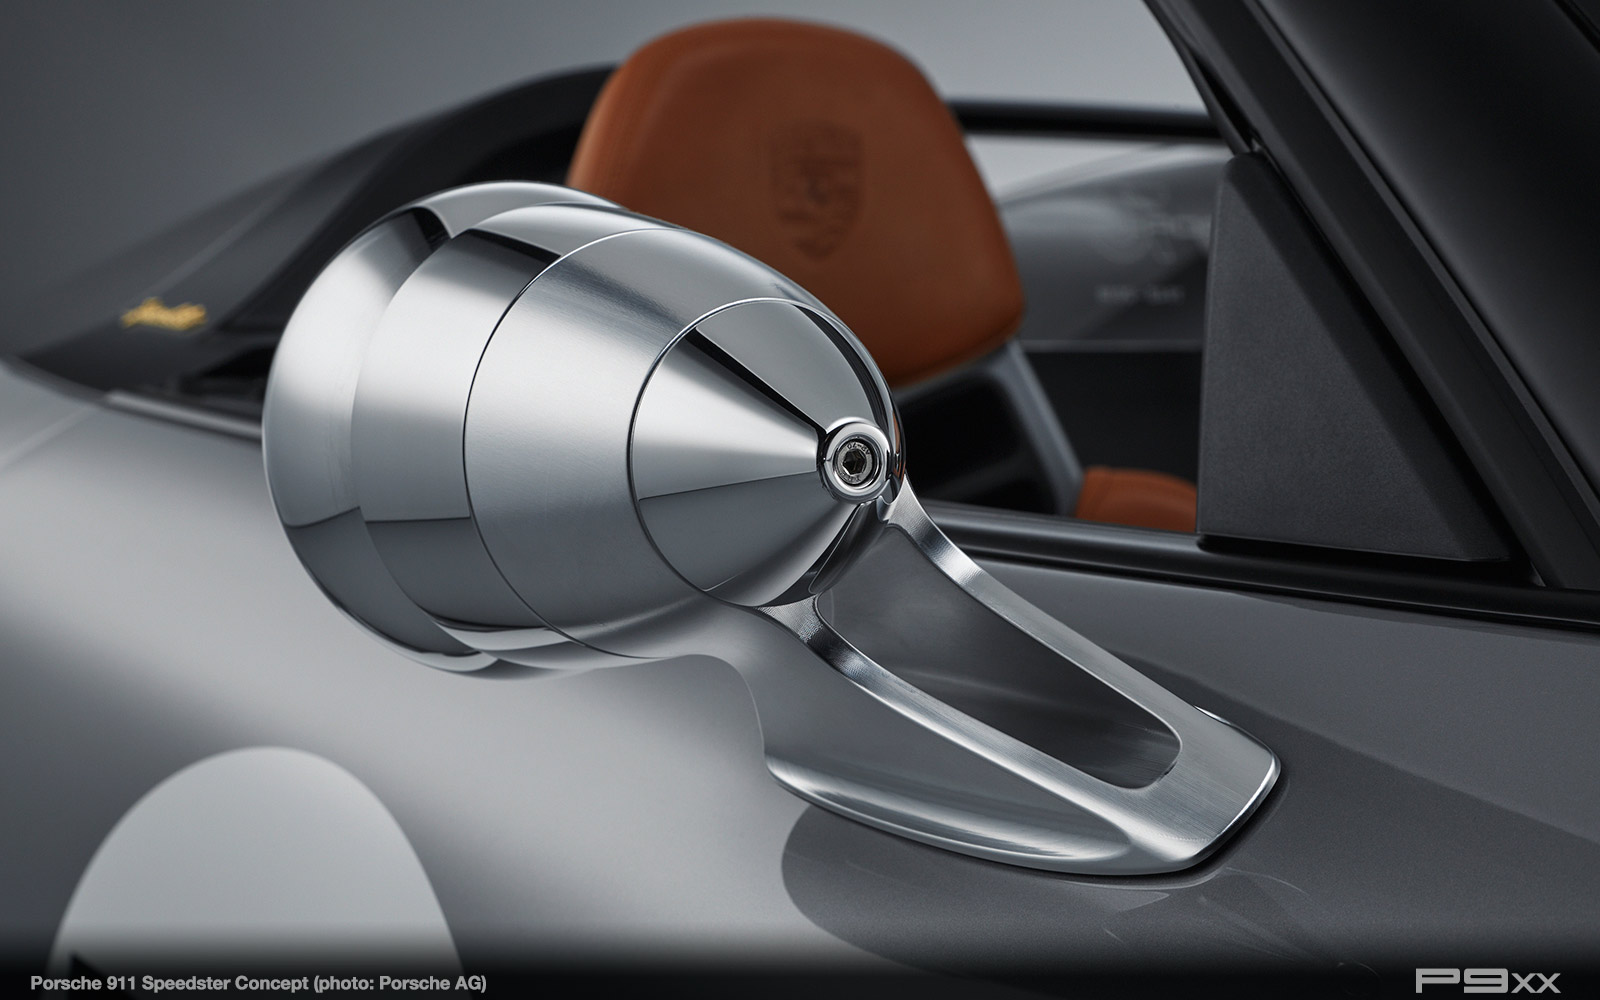 Porsche-911-Speedster-Concept-2018-301